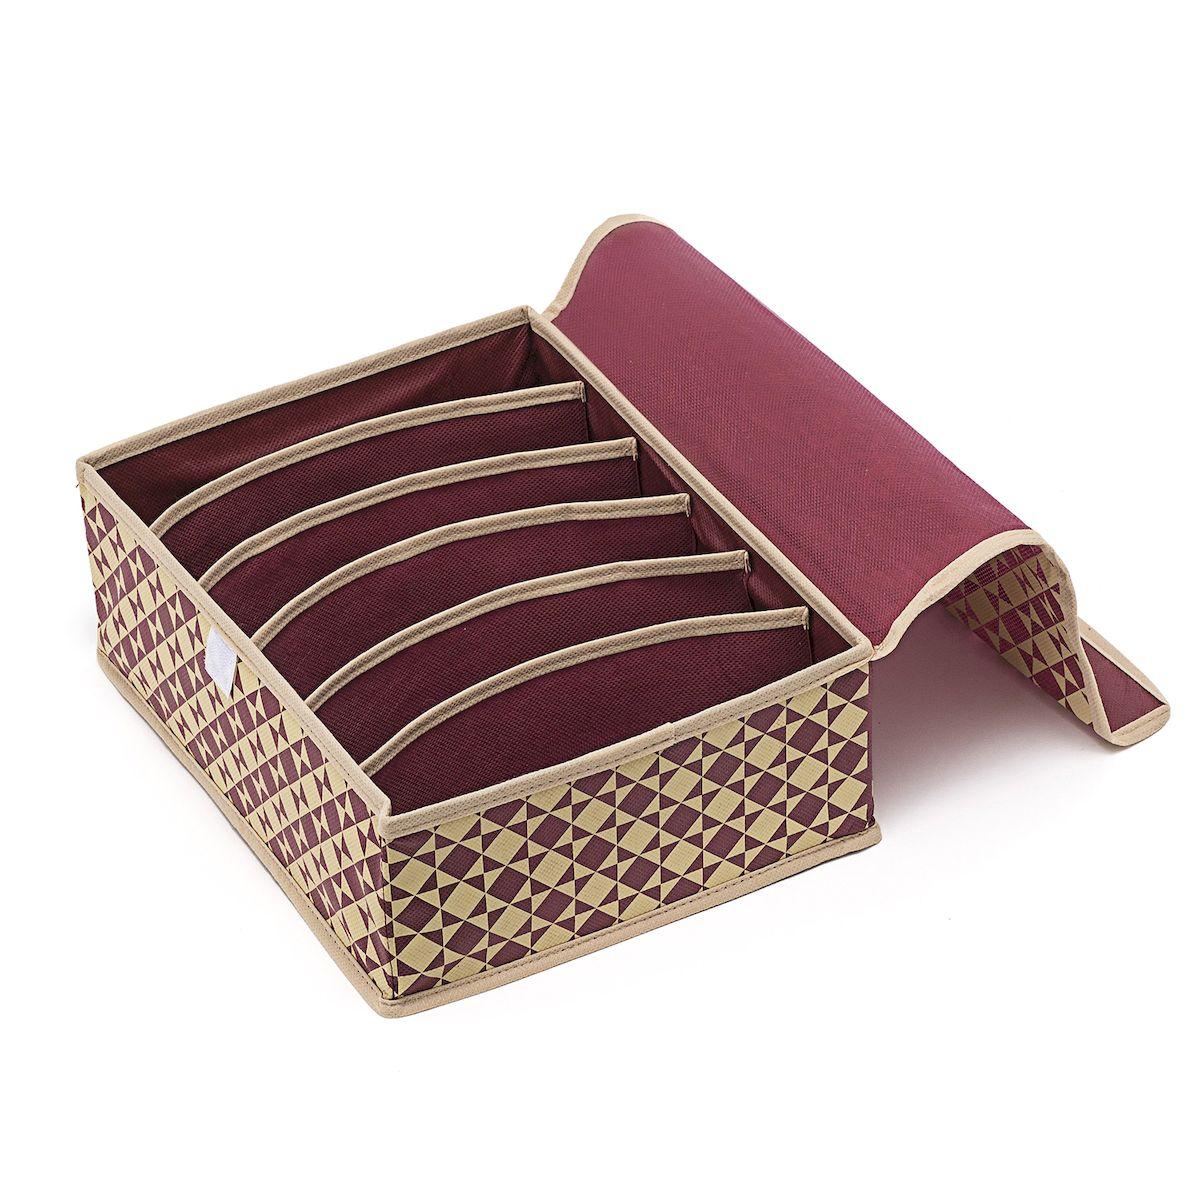 Органайзер для хранения Homsu Bordo, 6 секций, 31 х 24 х 11 см набор органайзеров homsu ностальгия с крышкой 31 х 24 х 11 см 3 шт